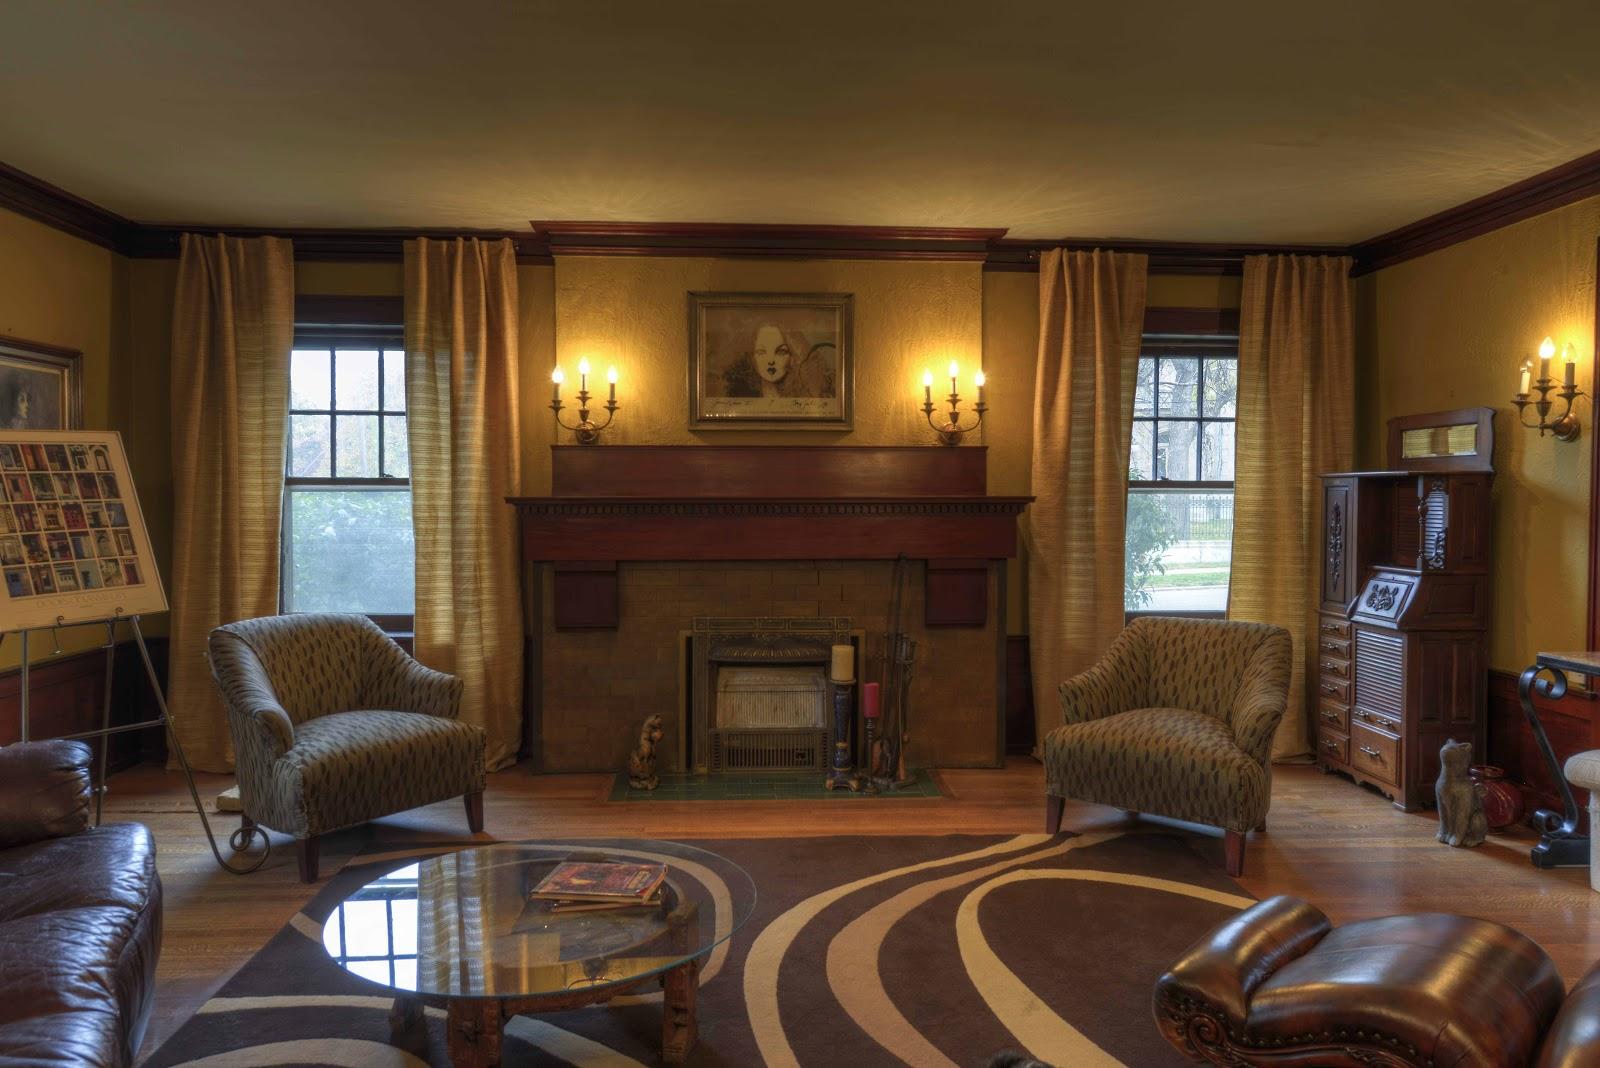 Hyperblogal: Historic Northeast Mansions - Volume 8- Townley Manor